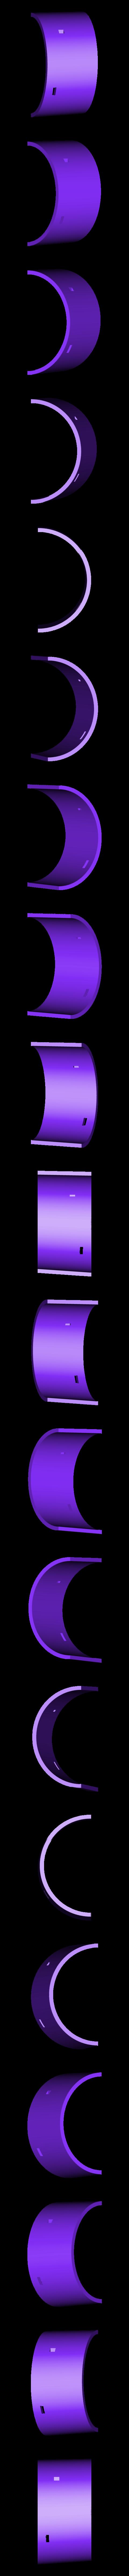 Boiler_Section_1_-_SCALED_Part_3a-.STL Download free STL file 4-8-8-4 Big Boy Locomotive • 3D printer object, RaymondDeLuca